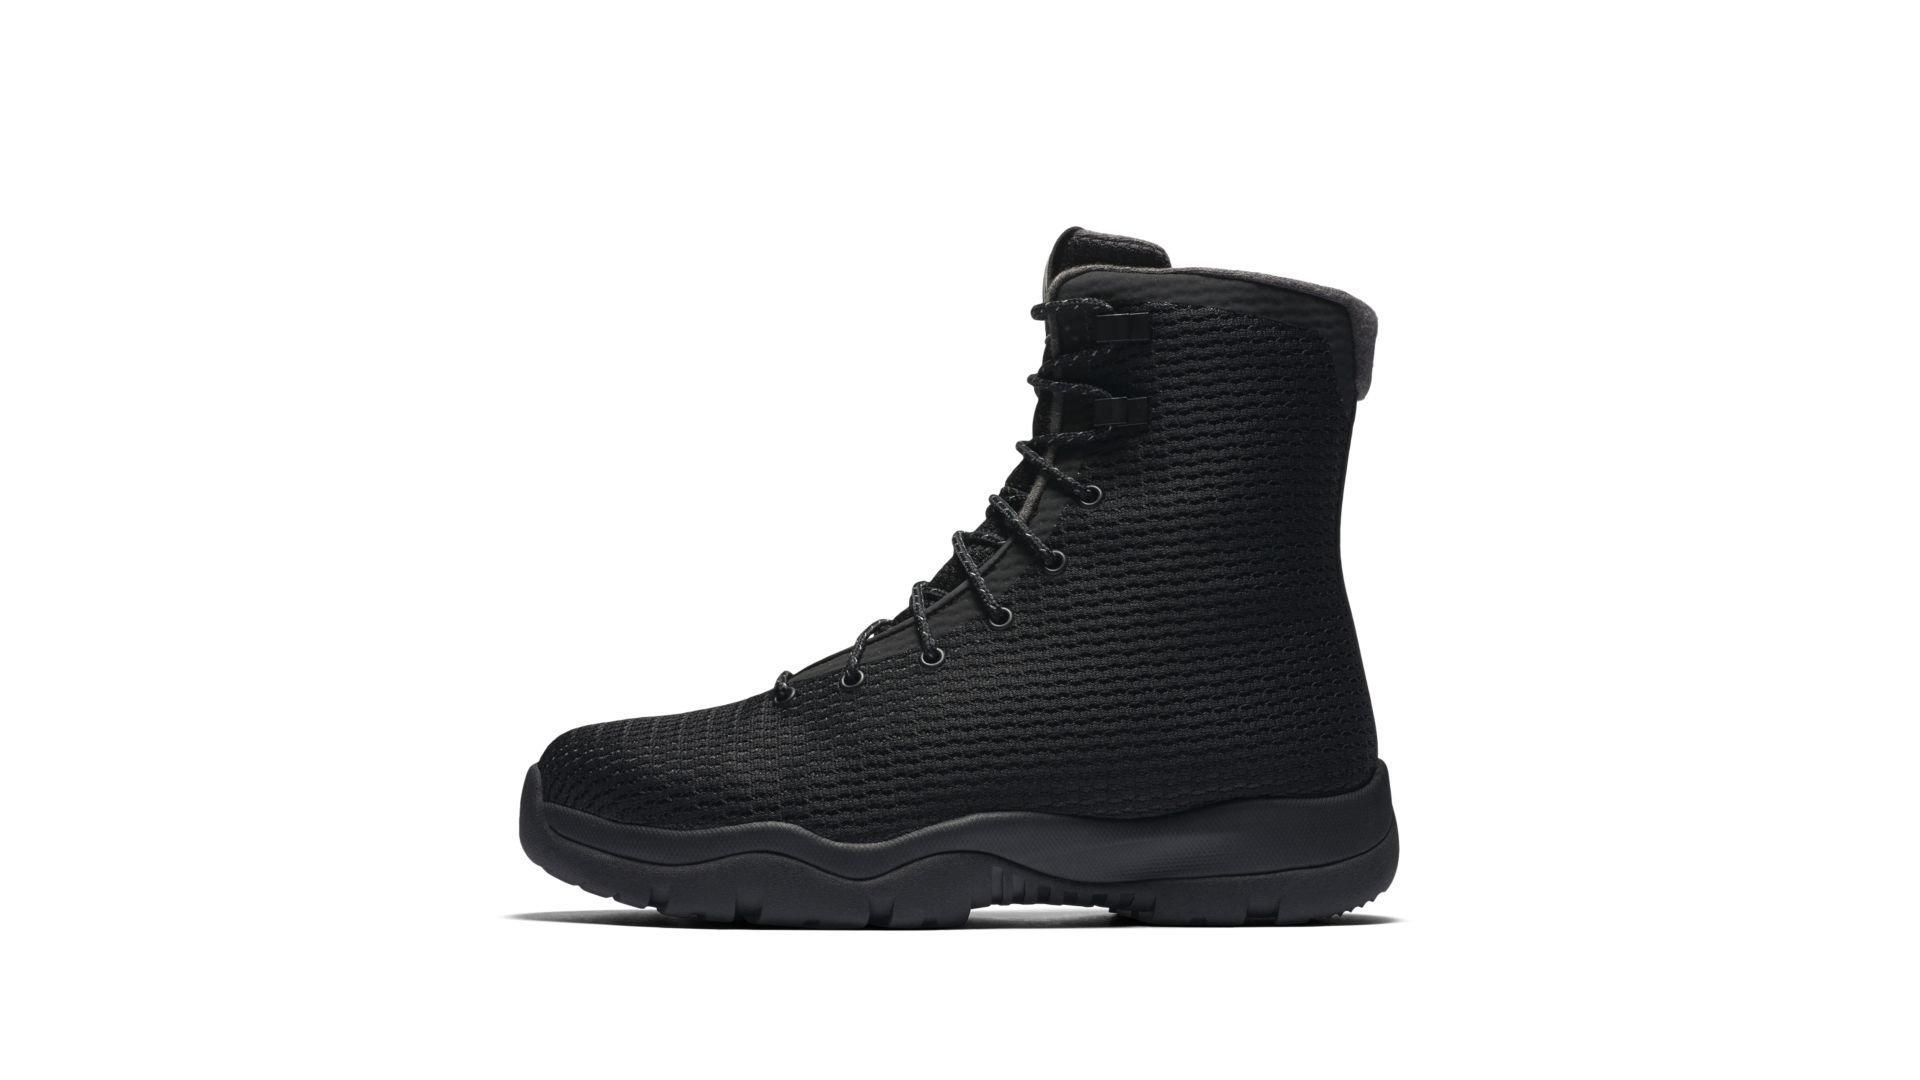 Jordan Future Boot Black (854554-002)